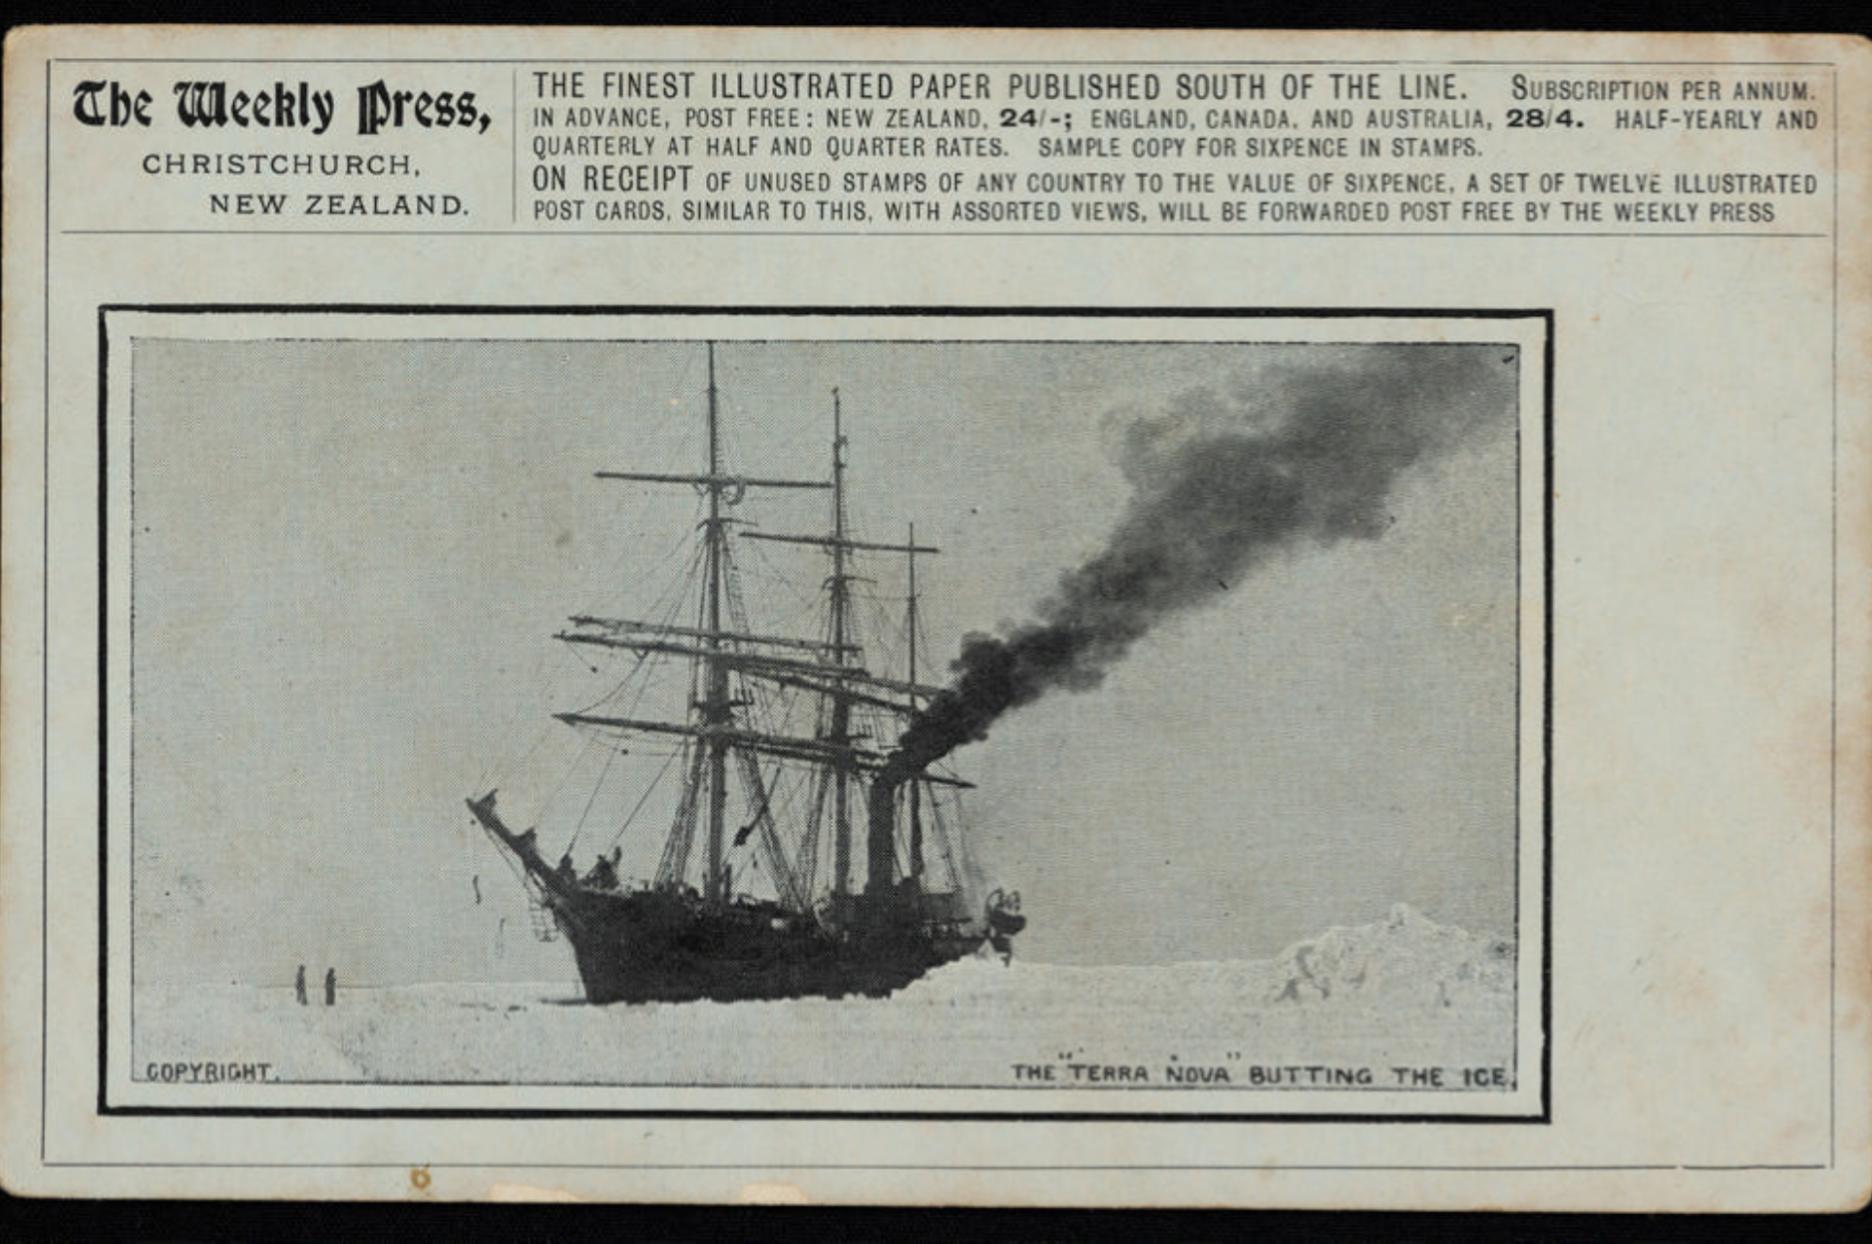 9921 1 The Weekly Press Postcard, the 'Terra Nova' in the Antarctic Ice, 1910-13.